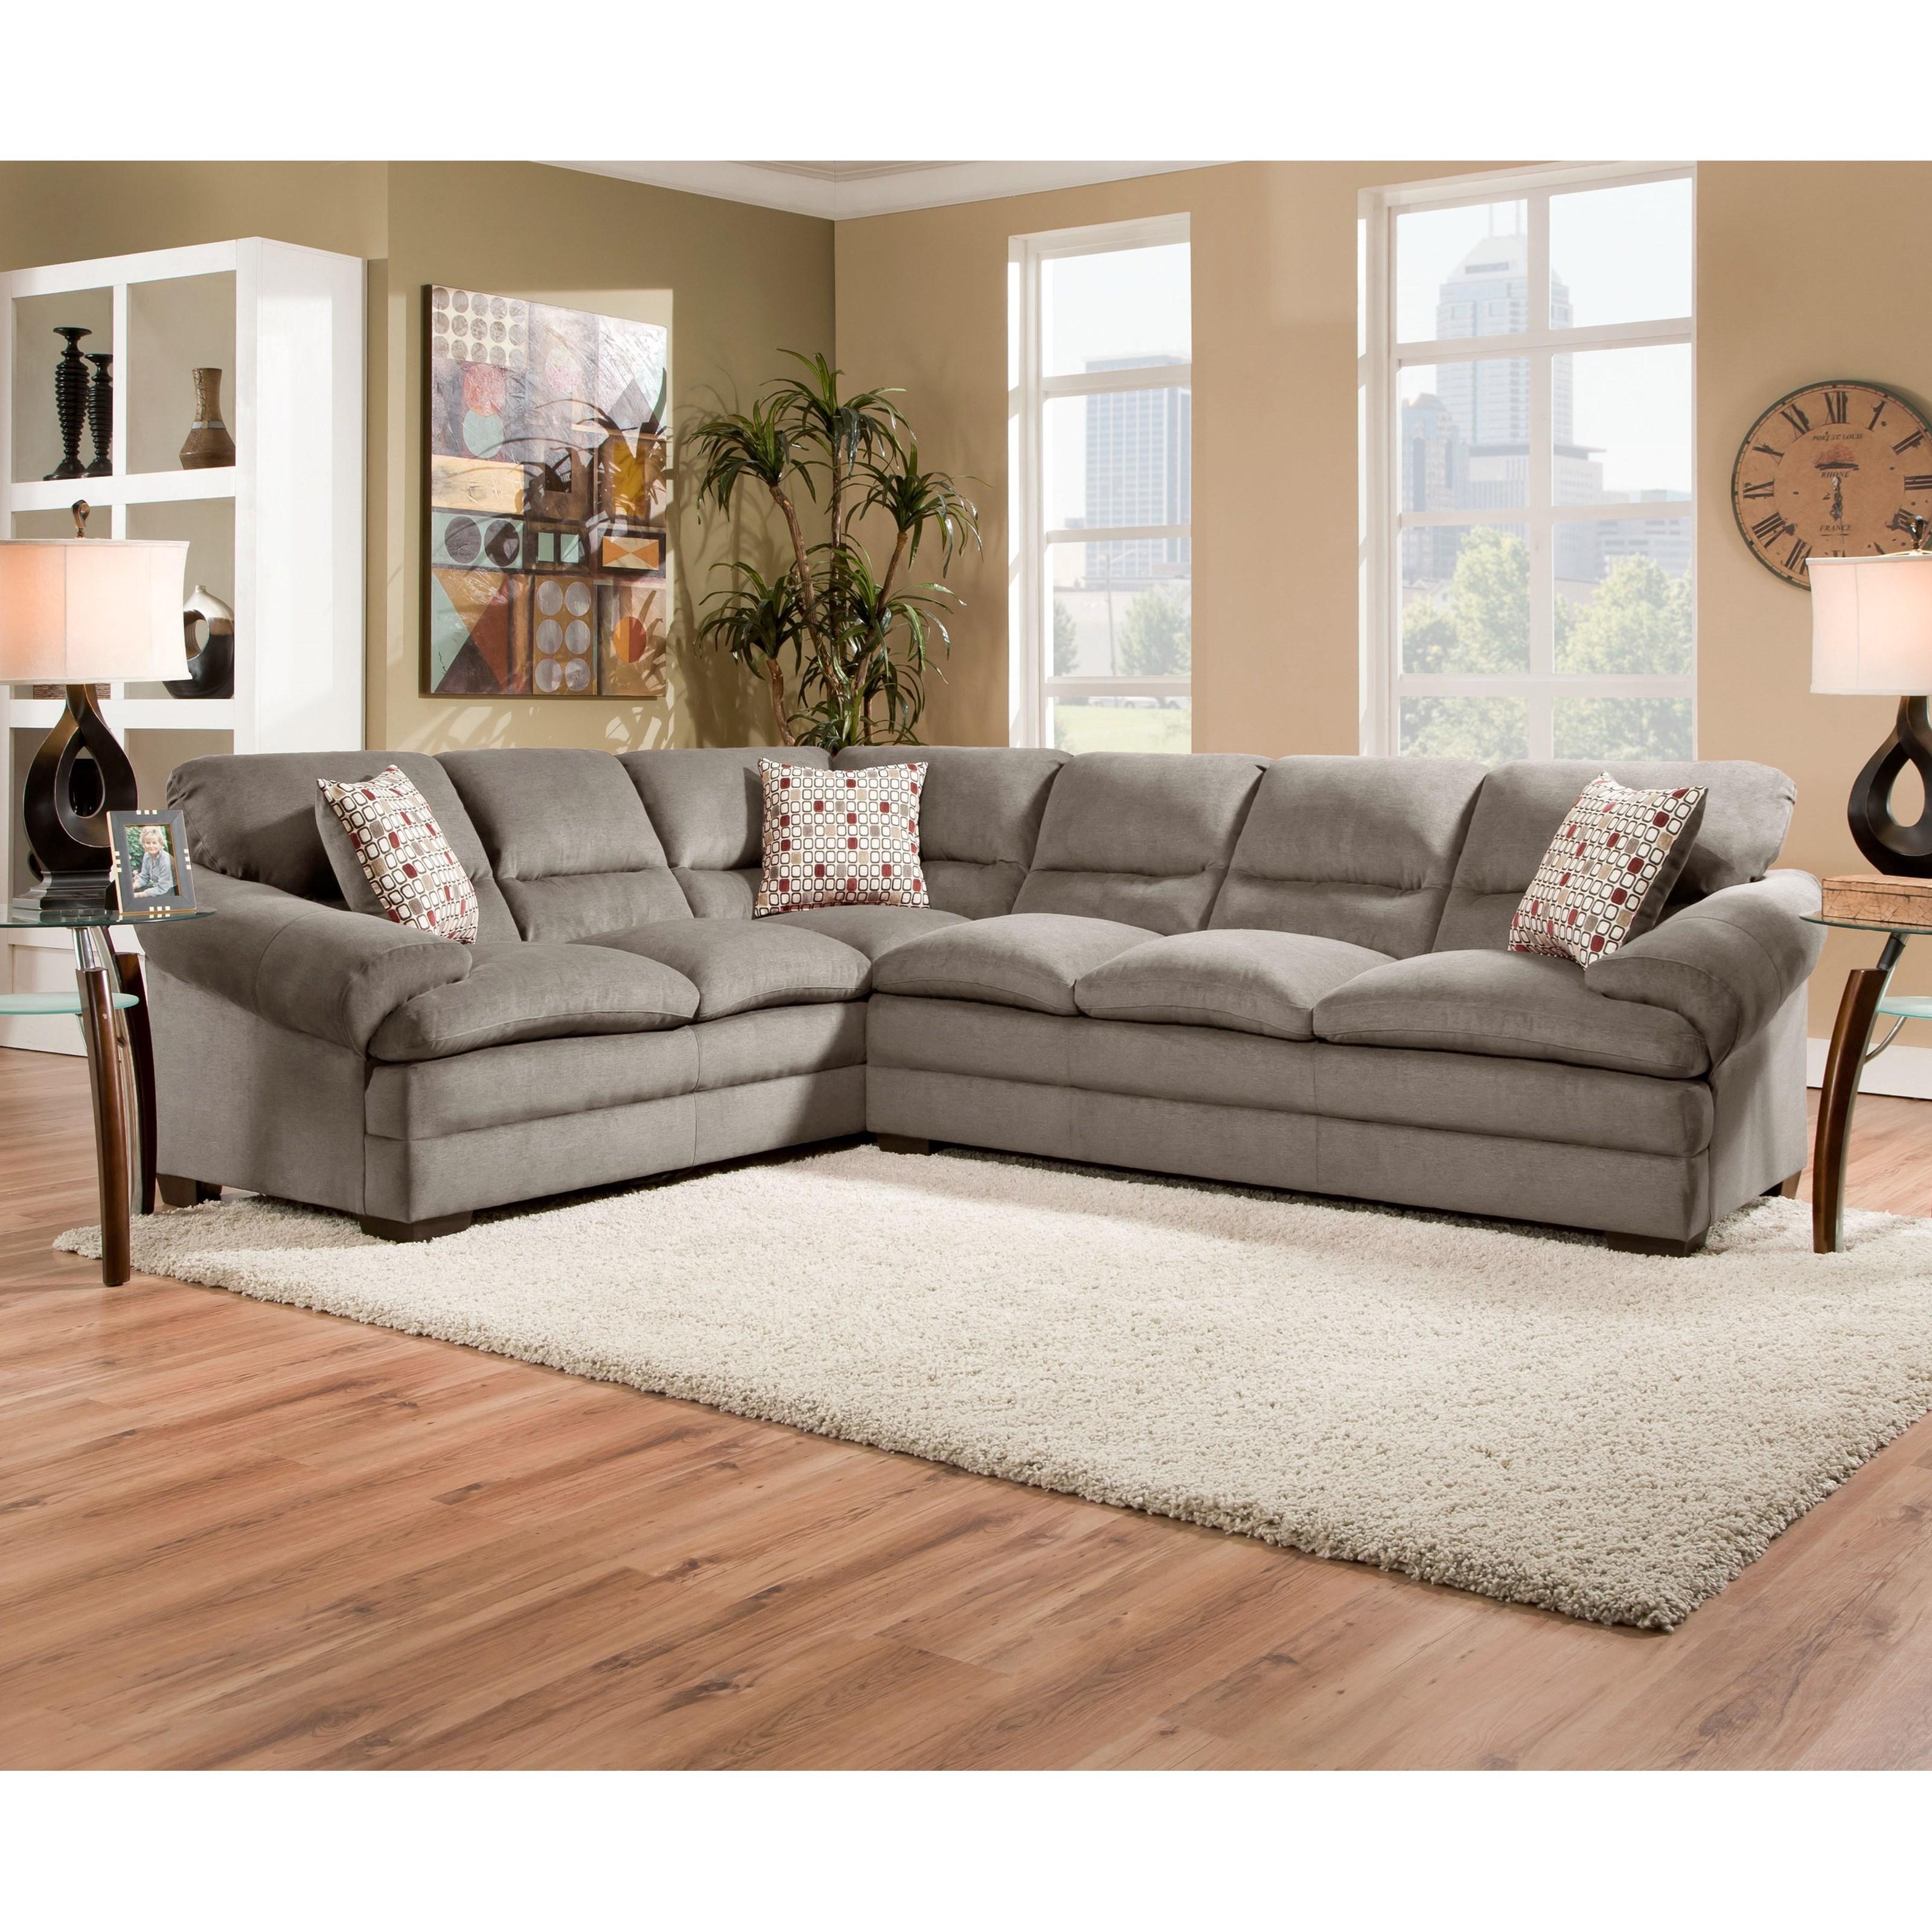 United Furniture Industries 6587 Casual Sectional Sofa - Item Number: 6587LAFSofa+RAFSofa-MirandaShale